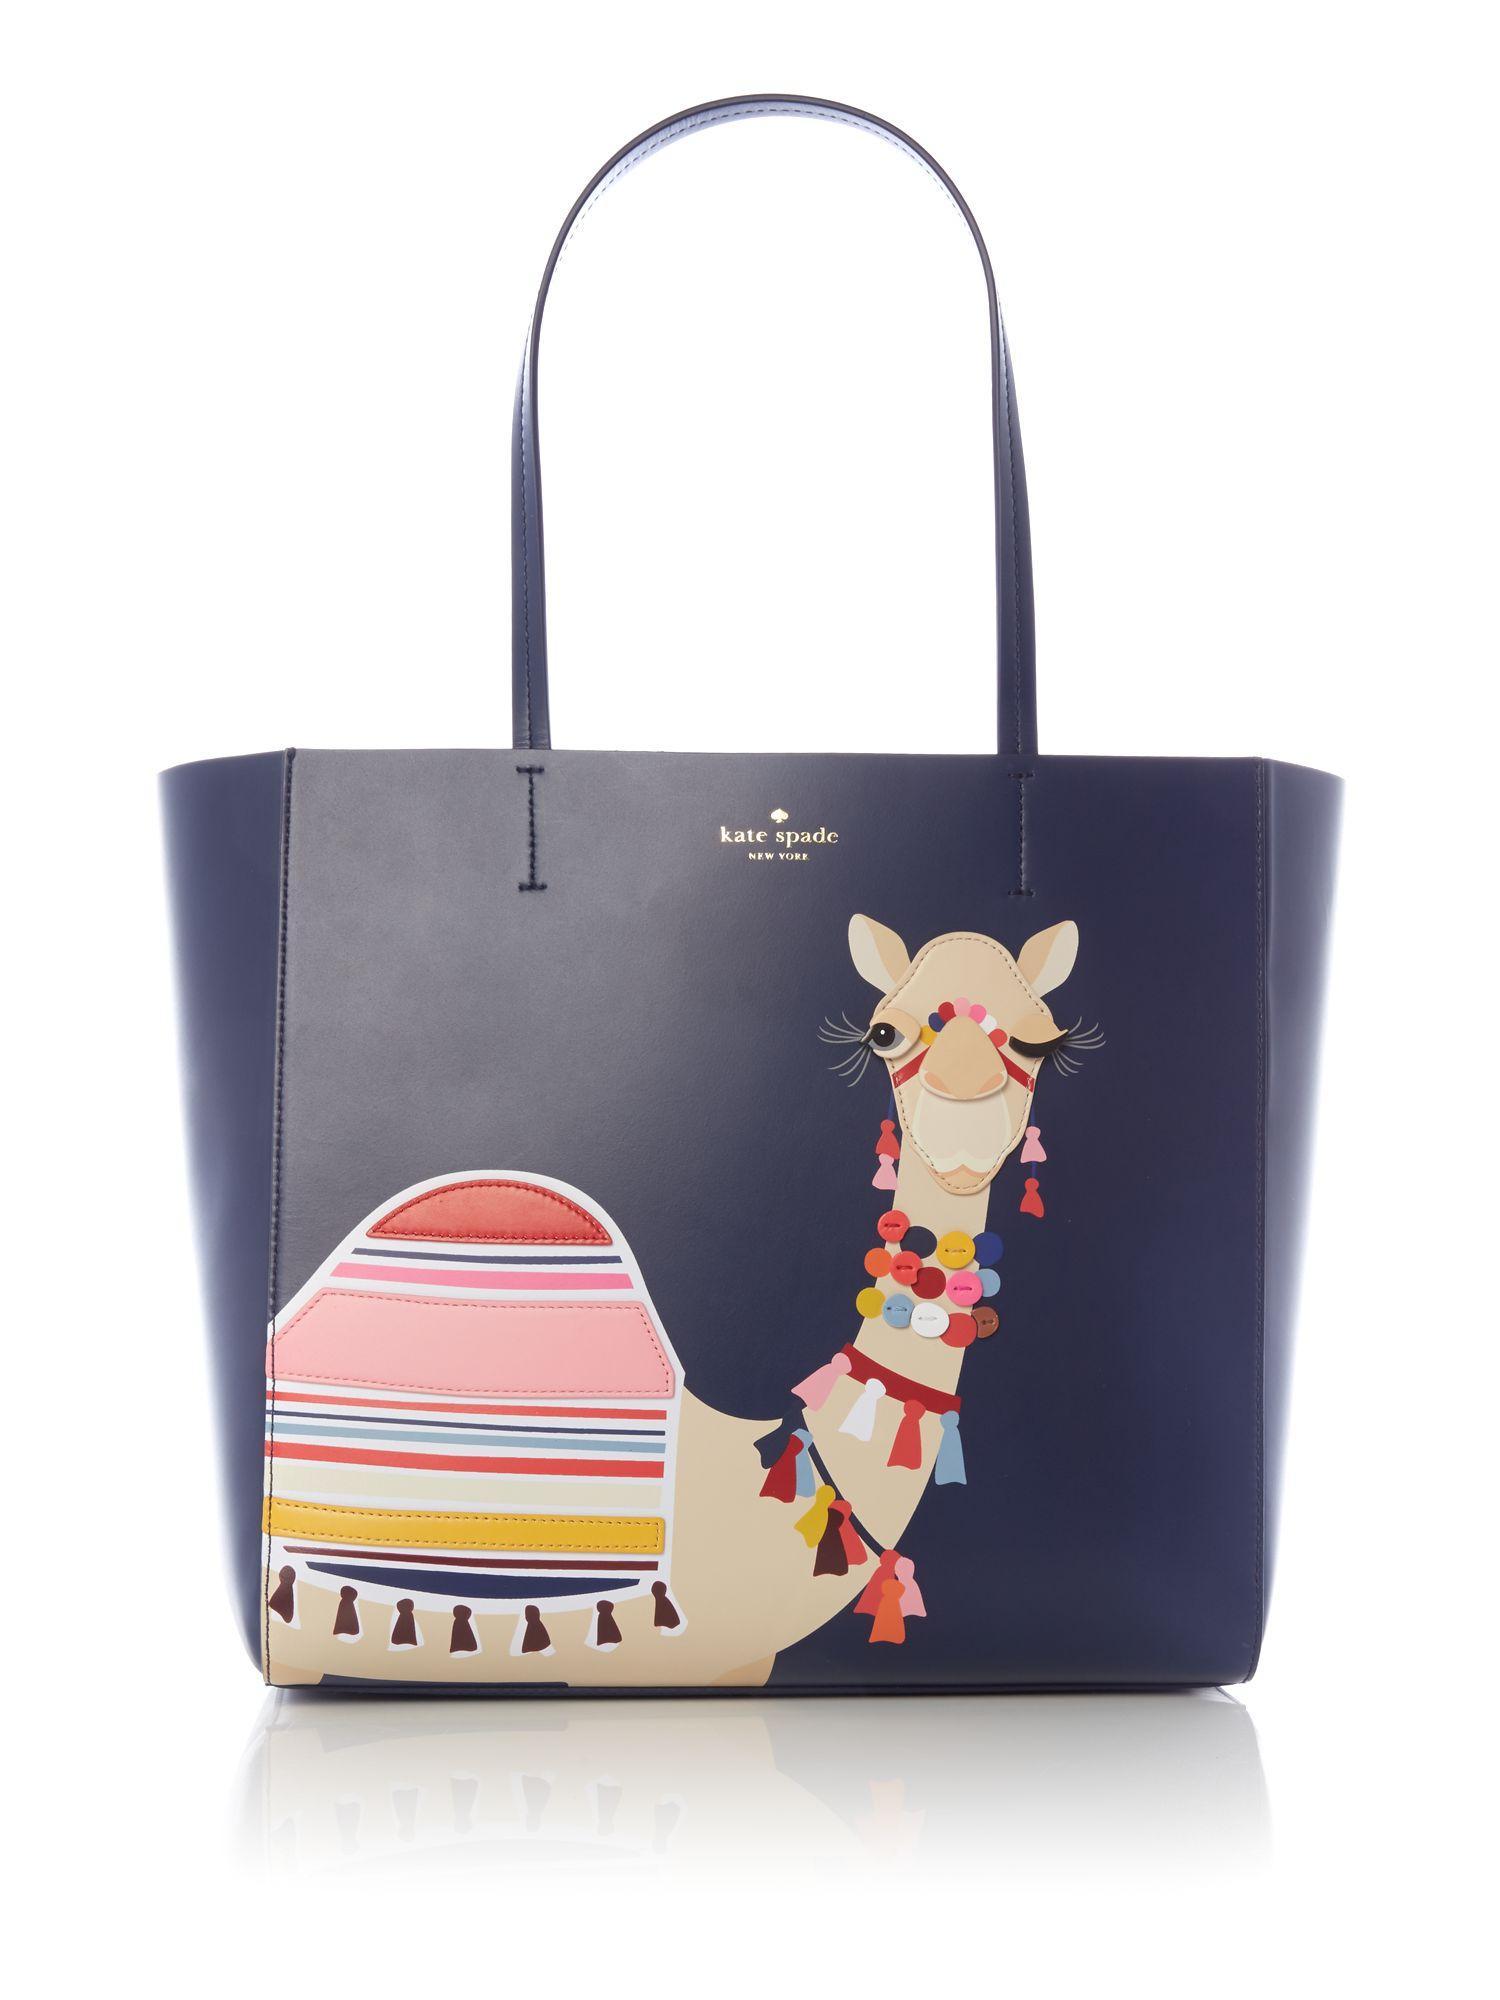 Lyst Kate Spade Camel Hallie Tote Bag In Blue